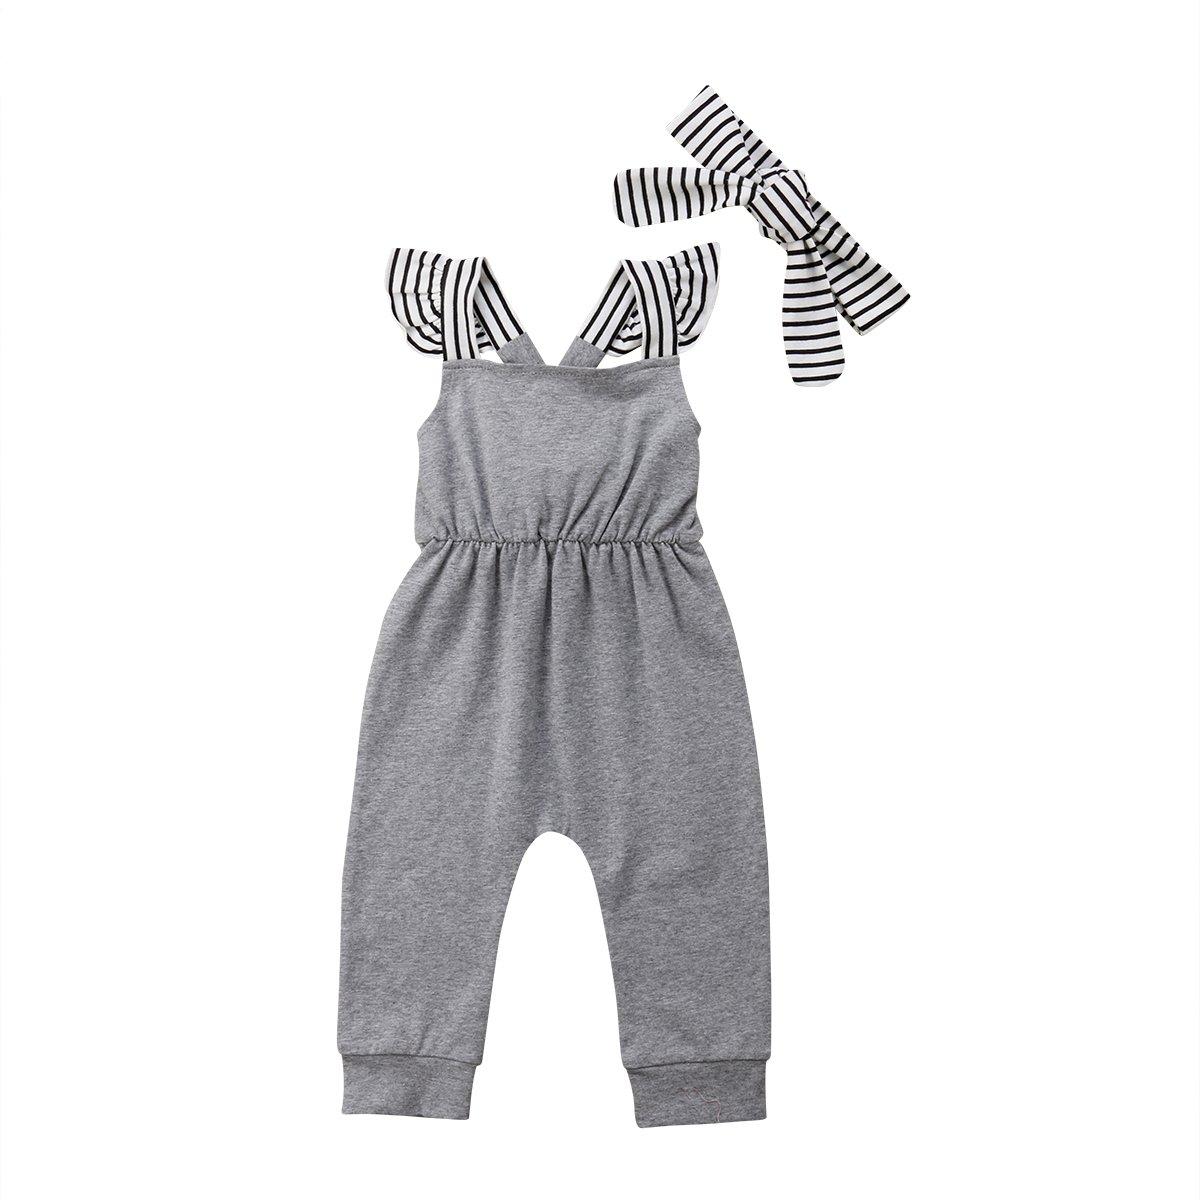 Infant Baby Girl Summer Rainbow Stripe One Piece Romper Bodysuit Clothes Set (Koala, 9-18 Months)